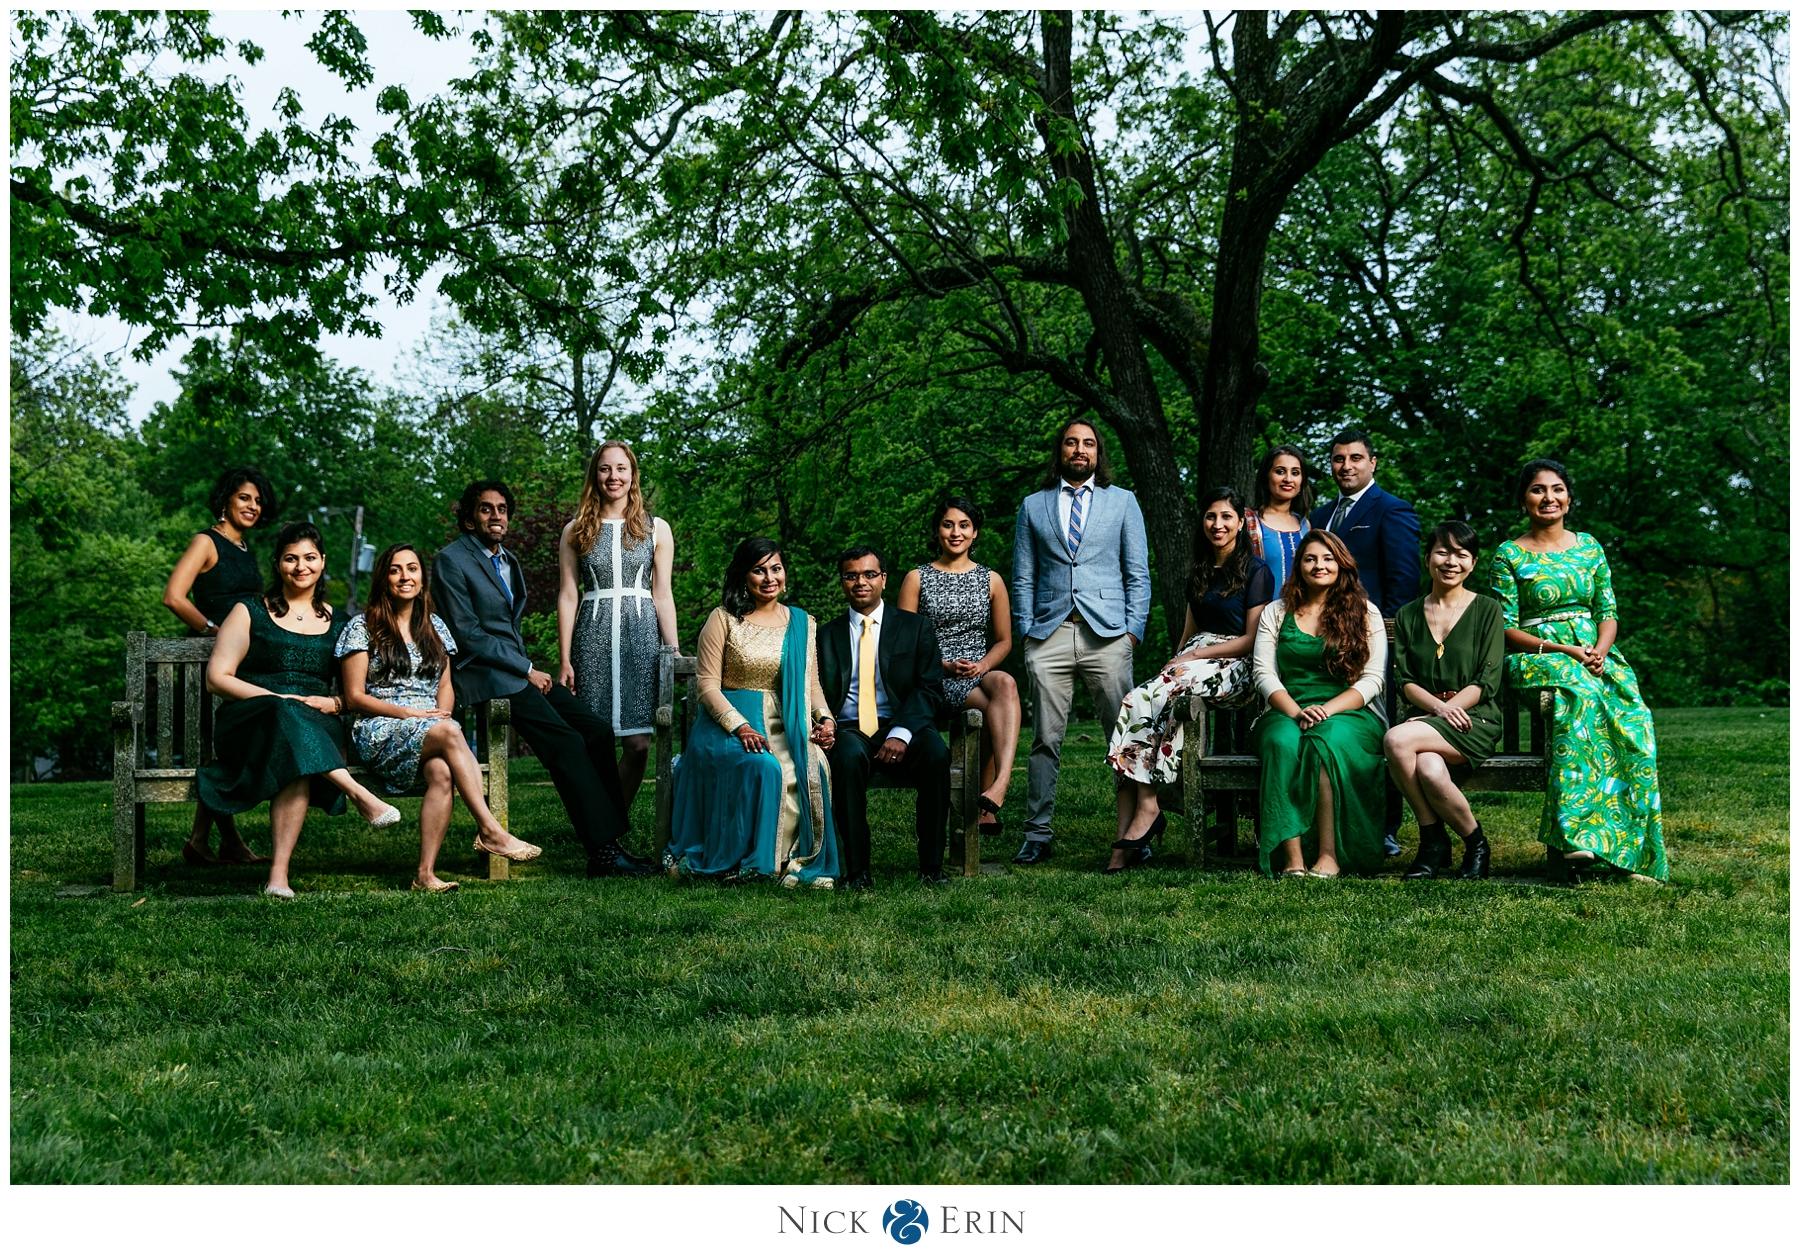 Donner_Photography_Arlington VA Wedding_Amrith and Aleefia_0011